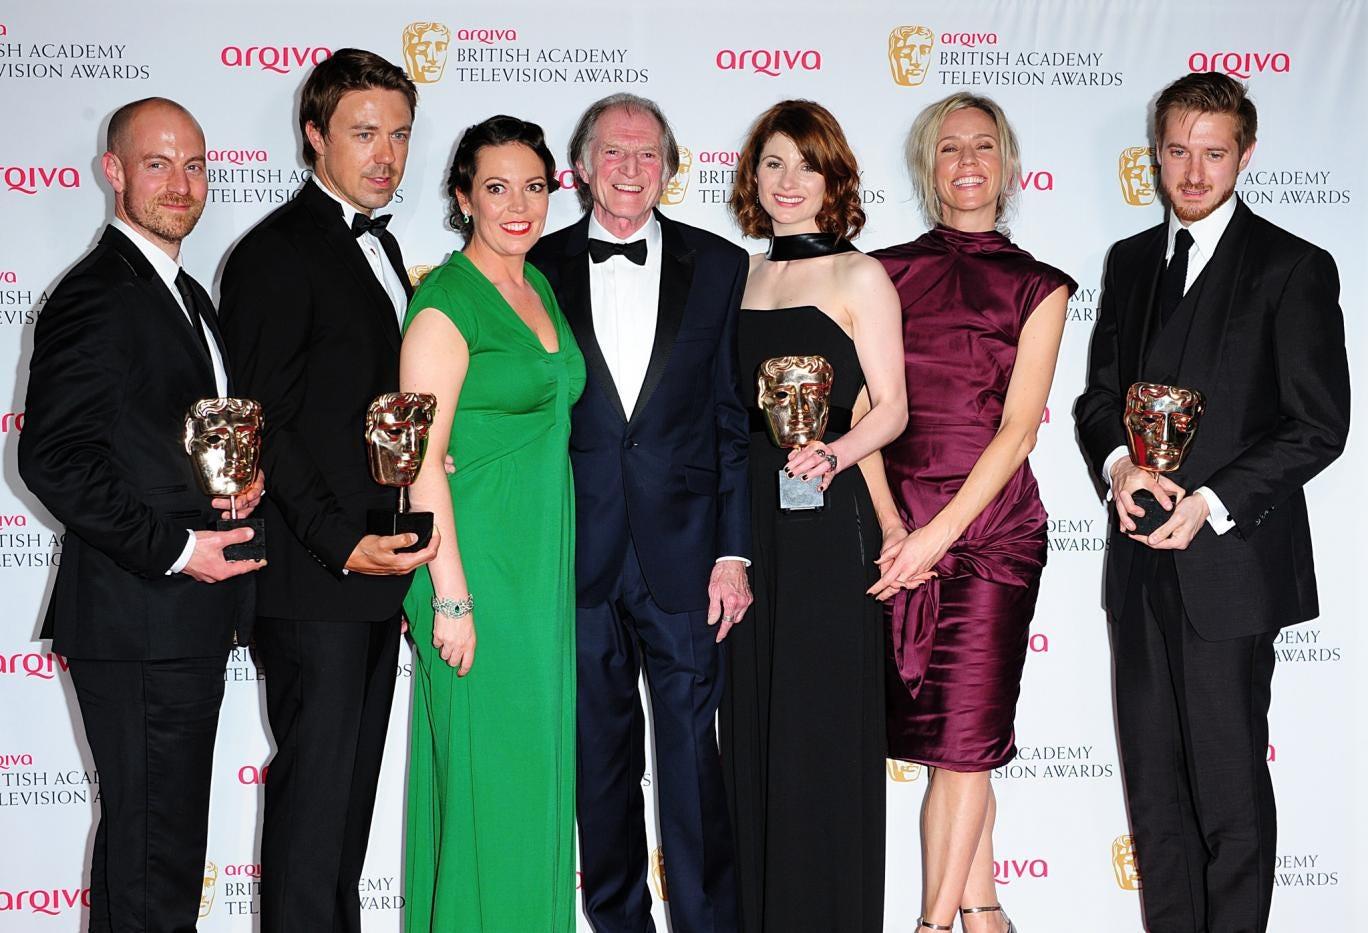 The cast of ITV drama series Broadchurch, which won three TV Baftas